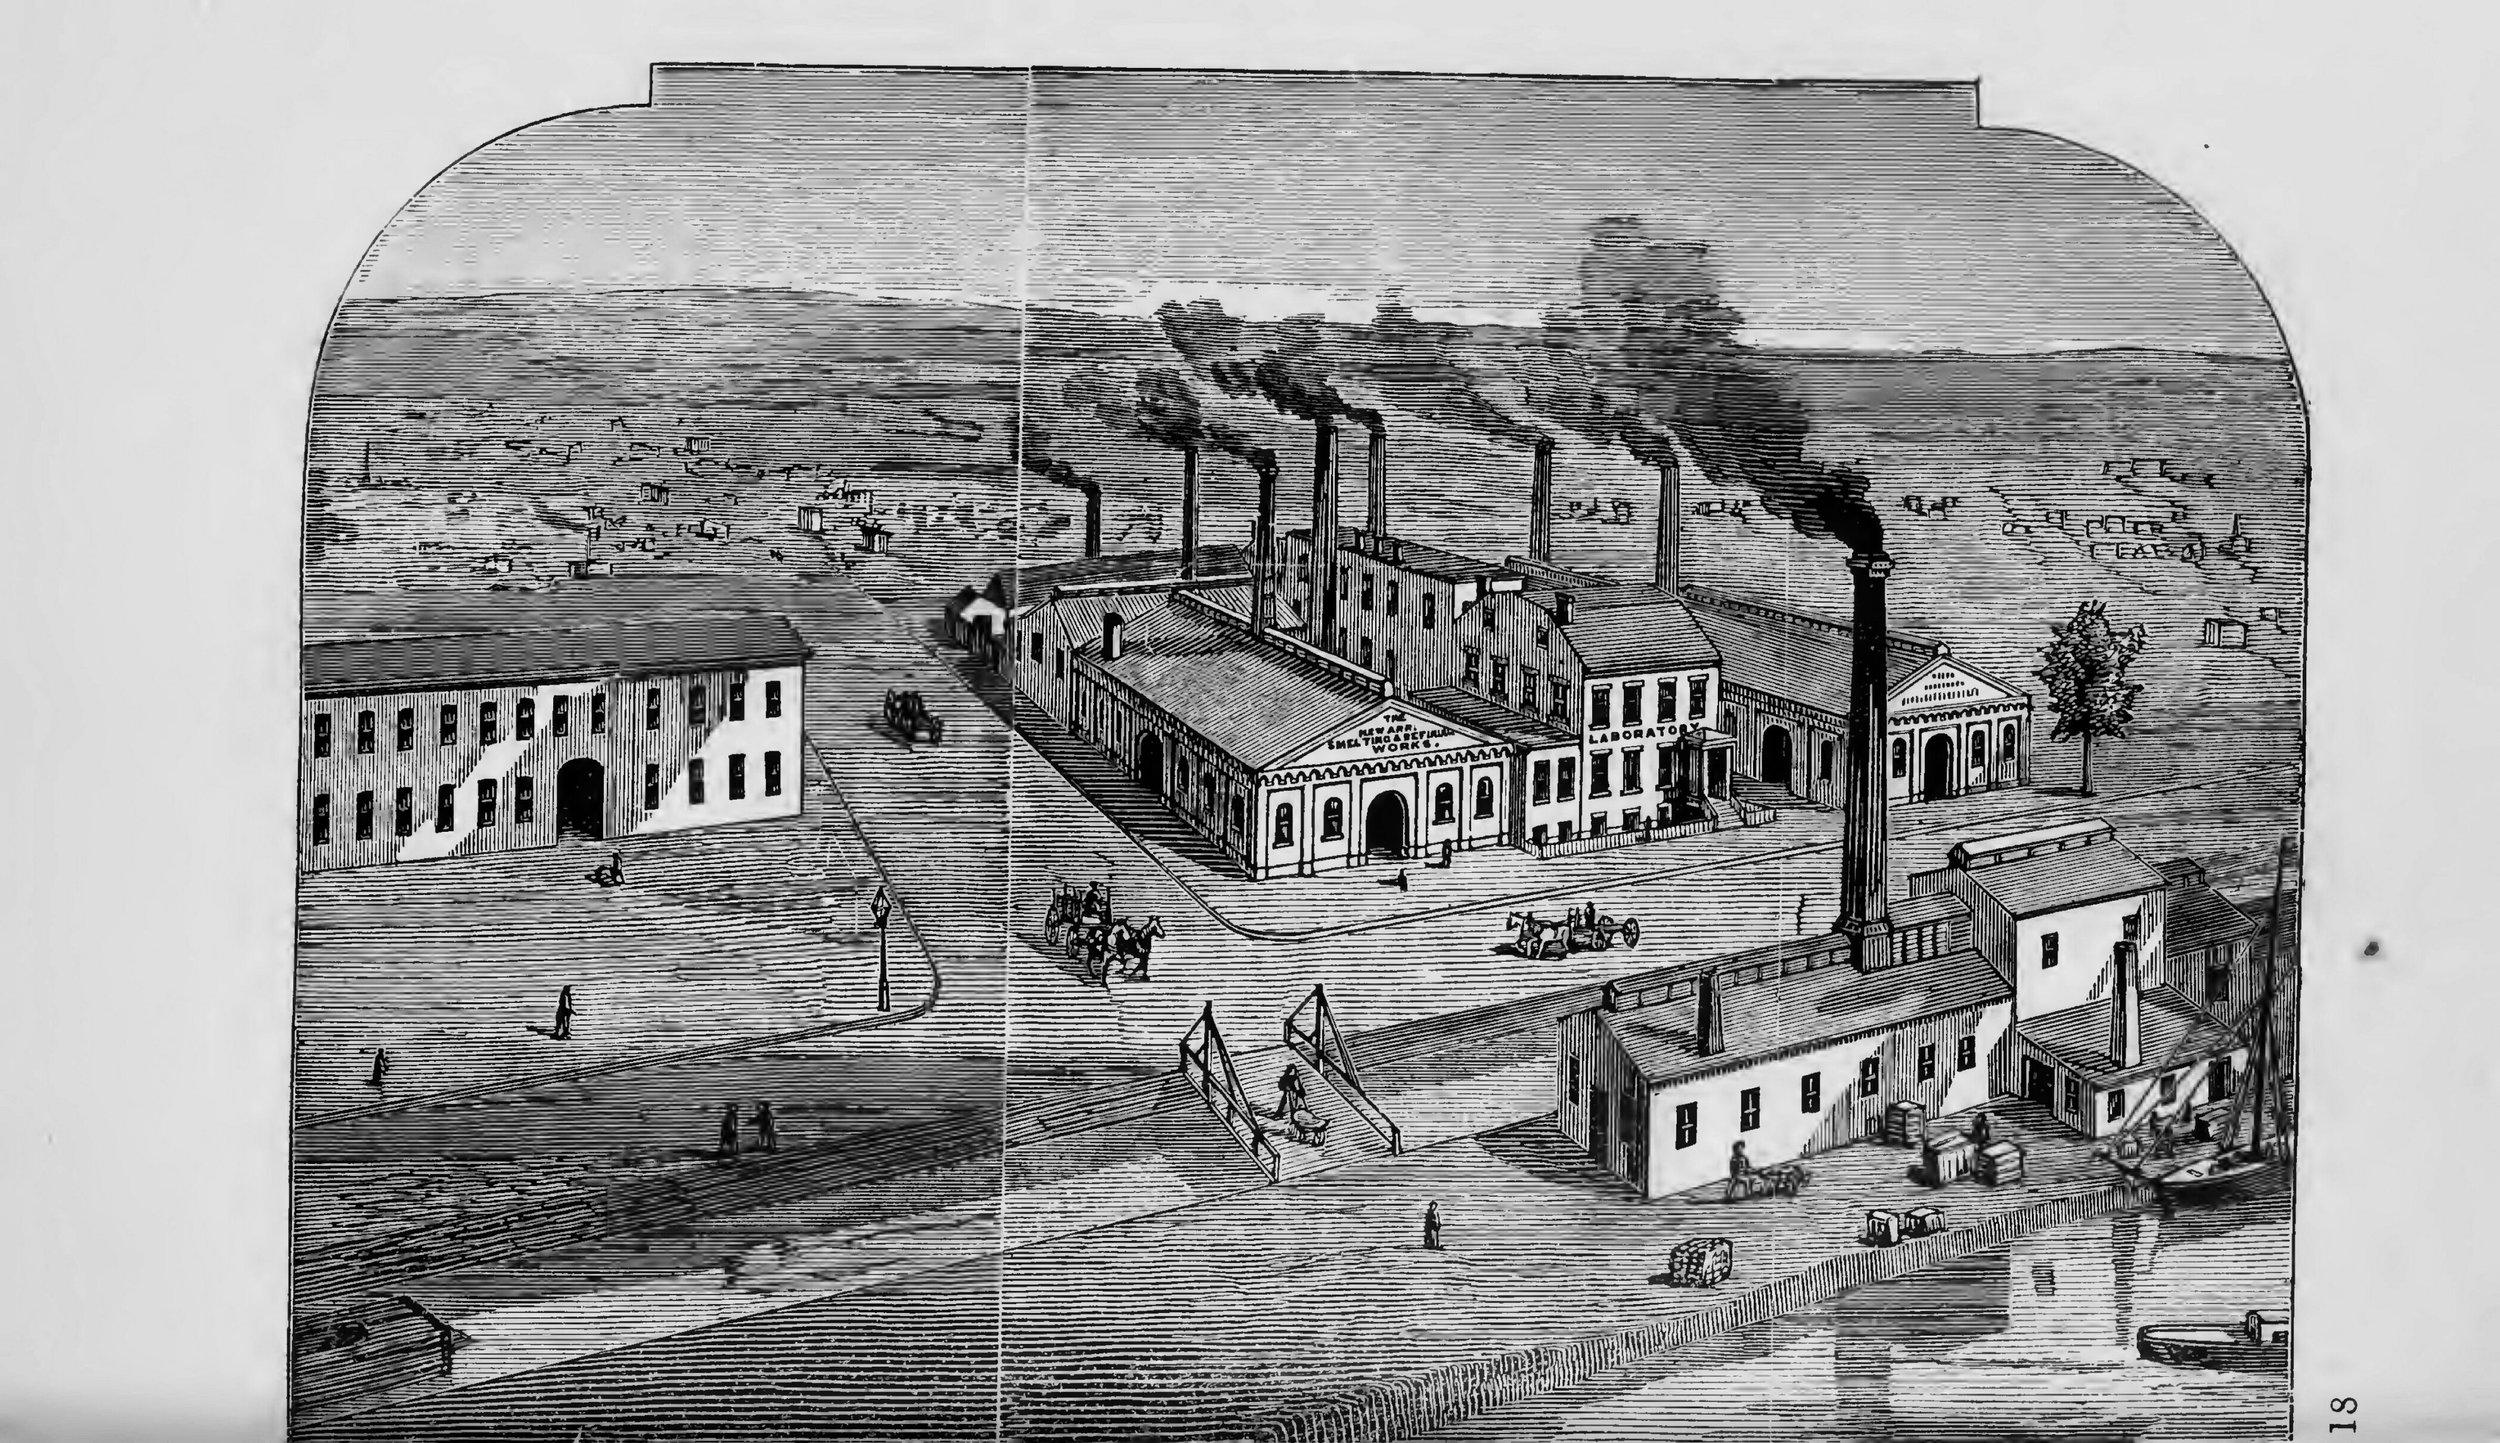 Franklin Ford, The Industrial Interest of Newark ,(N.J., New York: Van Arsdale & Co, 1874).